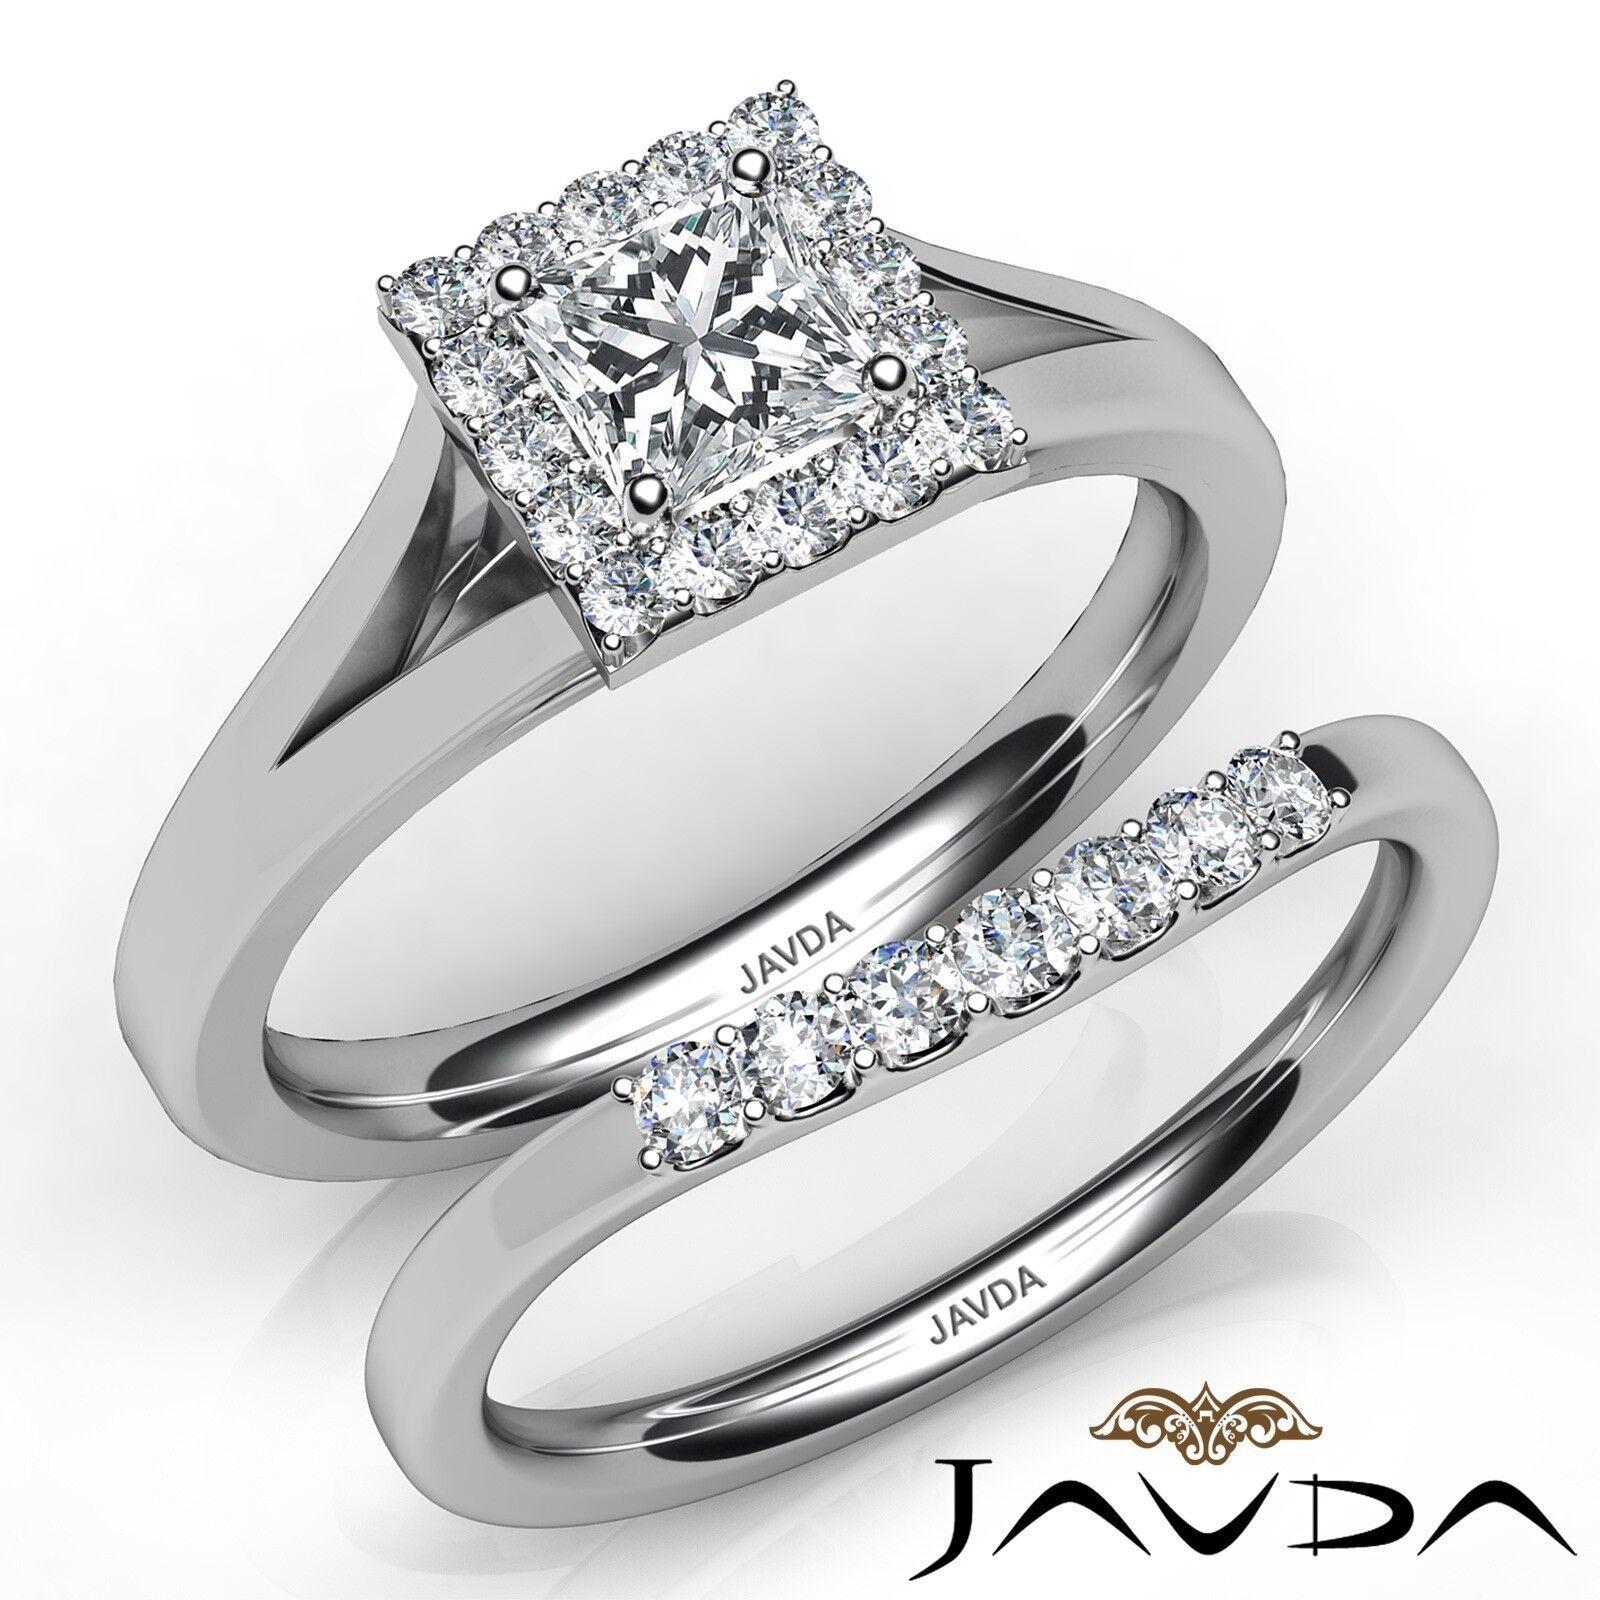 0.93ctw Halo Pave Bridal Princess Diamond Engagement Ring GIA F-VVS1 White Gold